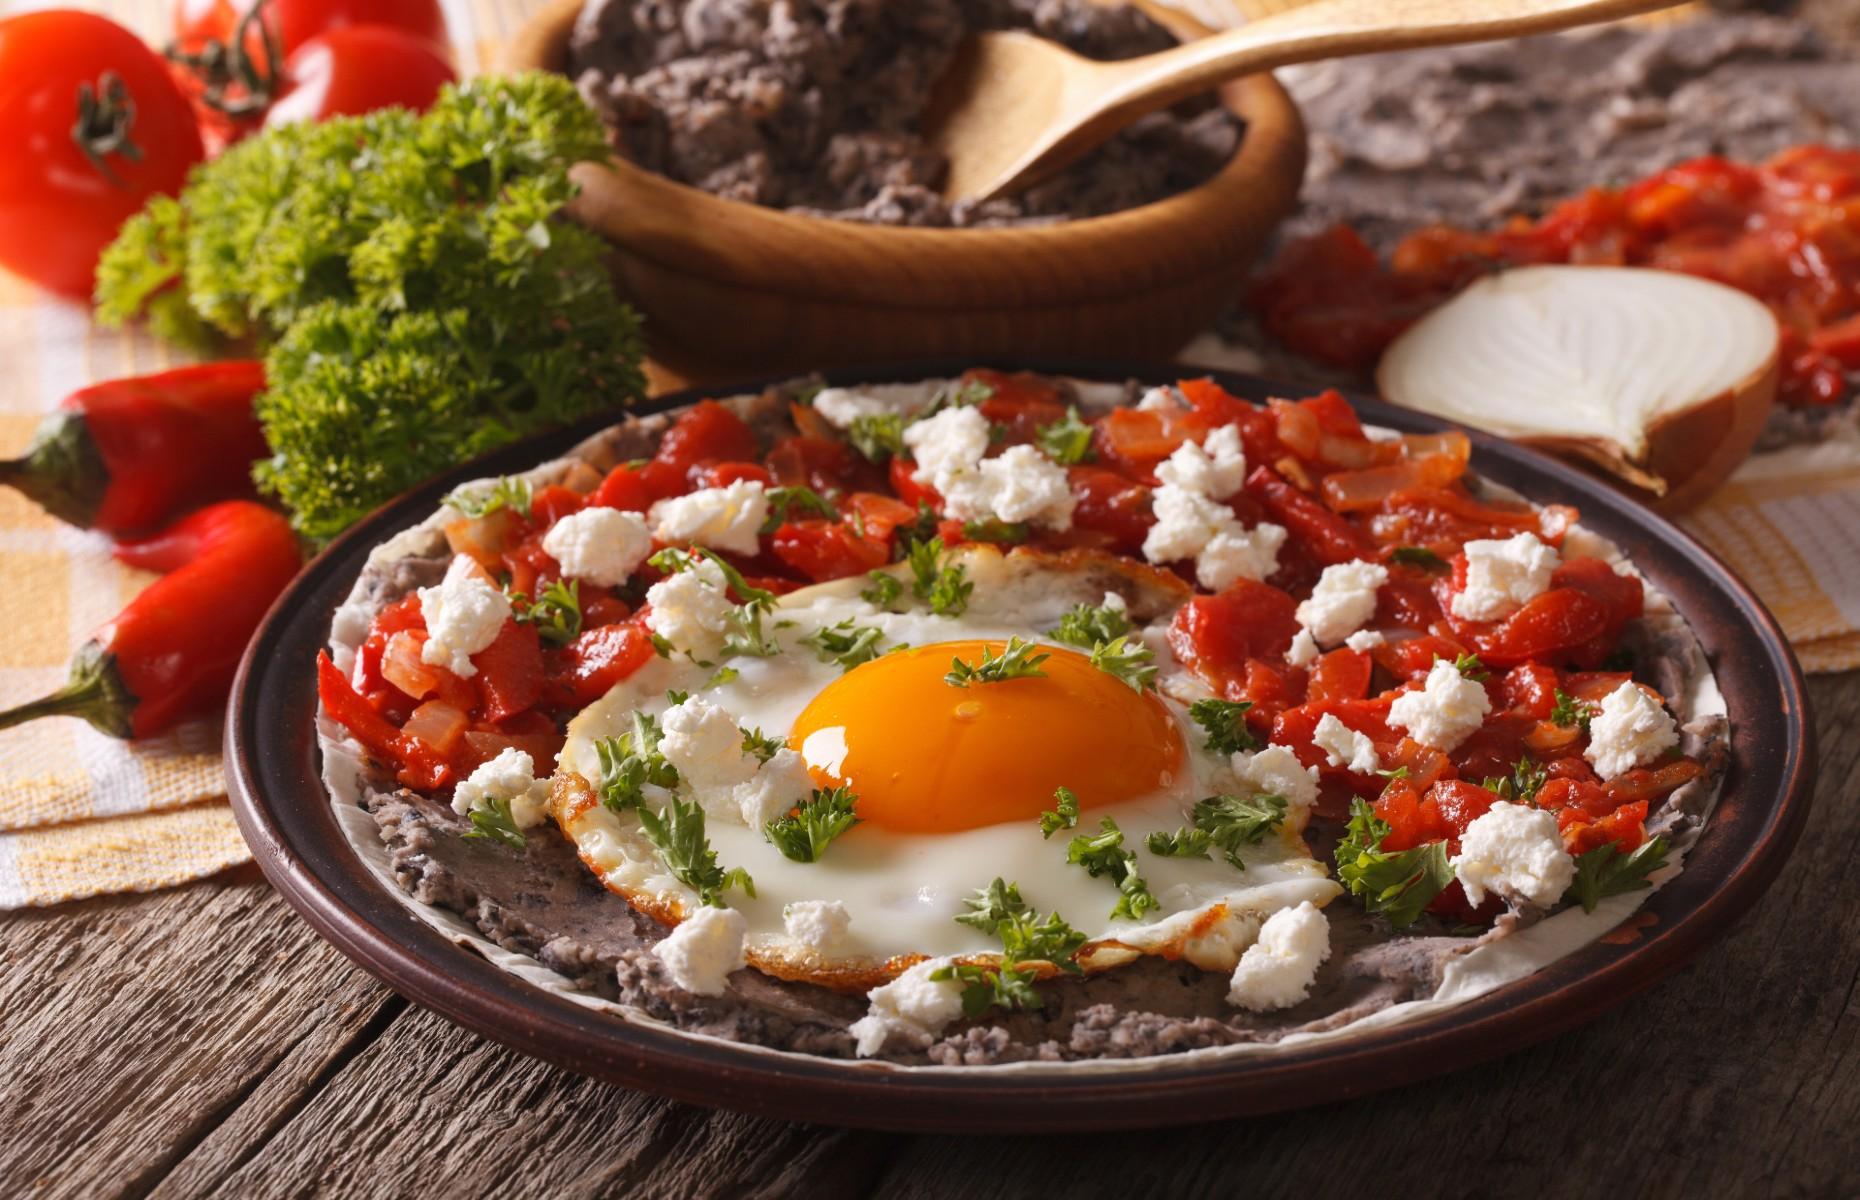 Huevos rancheros (Image: AS Food studio/Shutterstock)